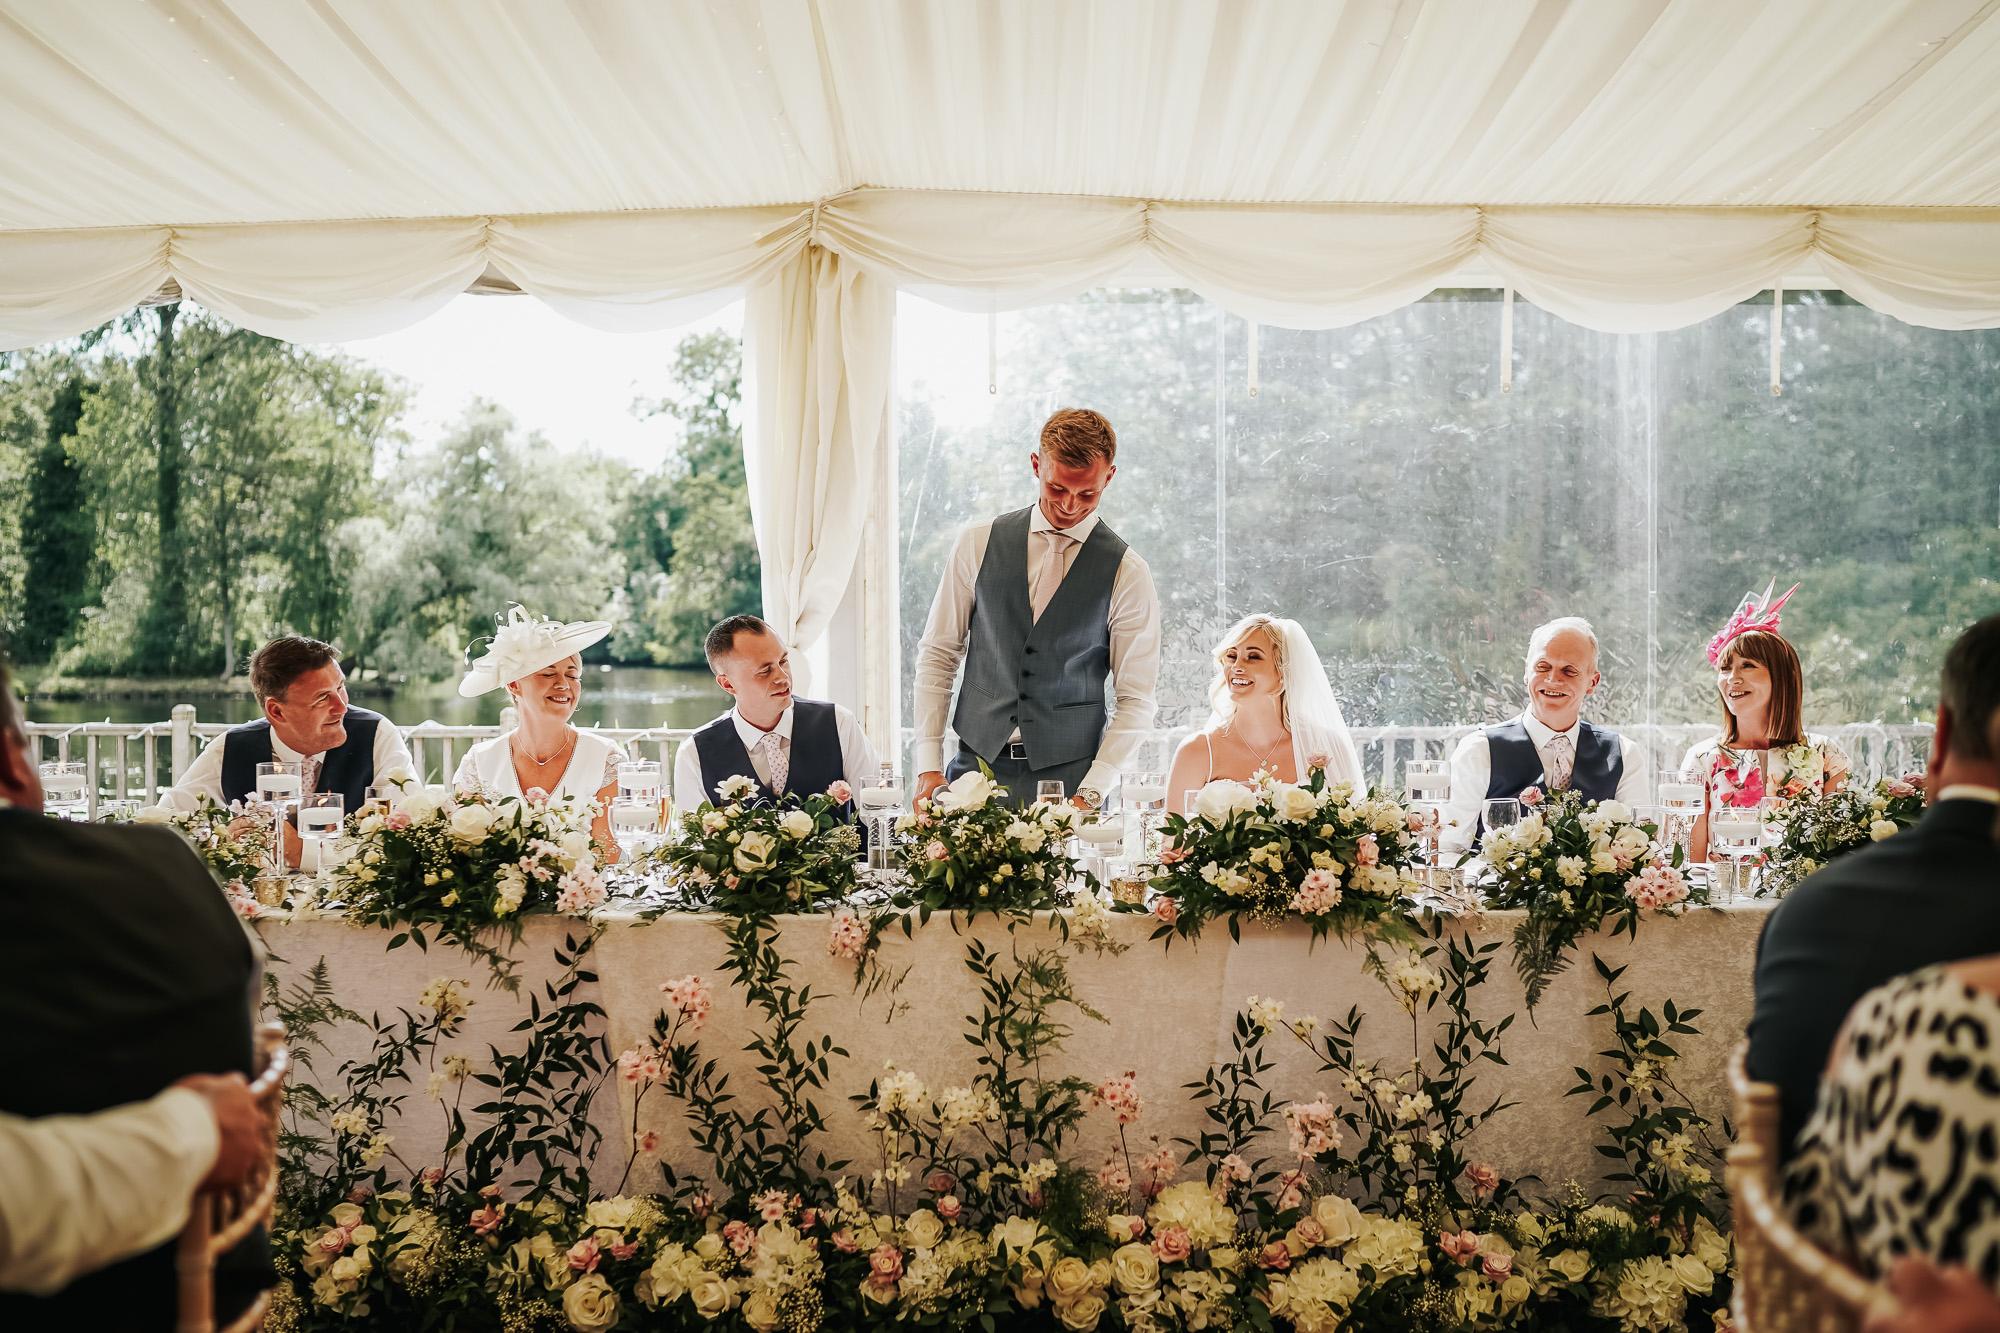 Thornton Manor Lakeside Marquee Wedding Photographer  (43 of 53).jpg